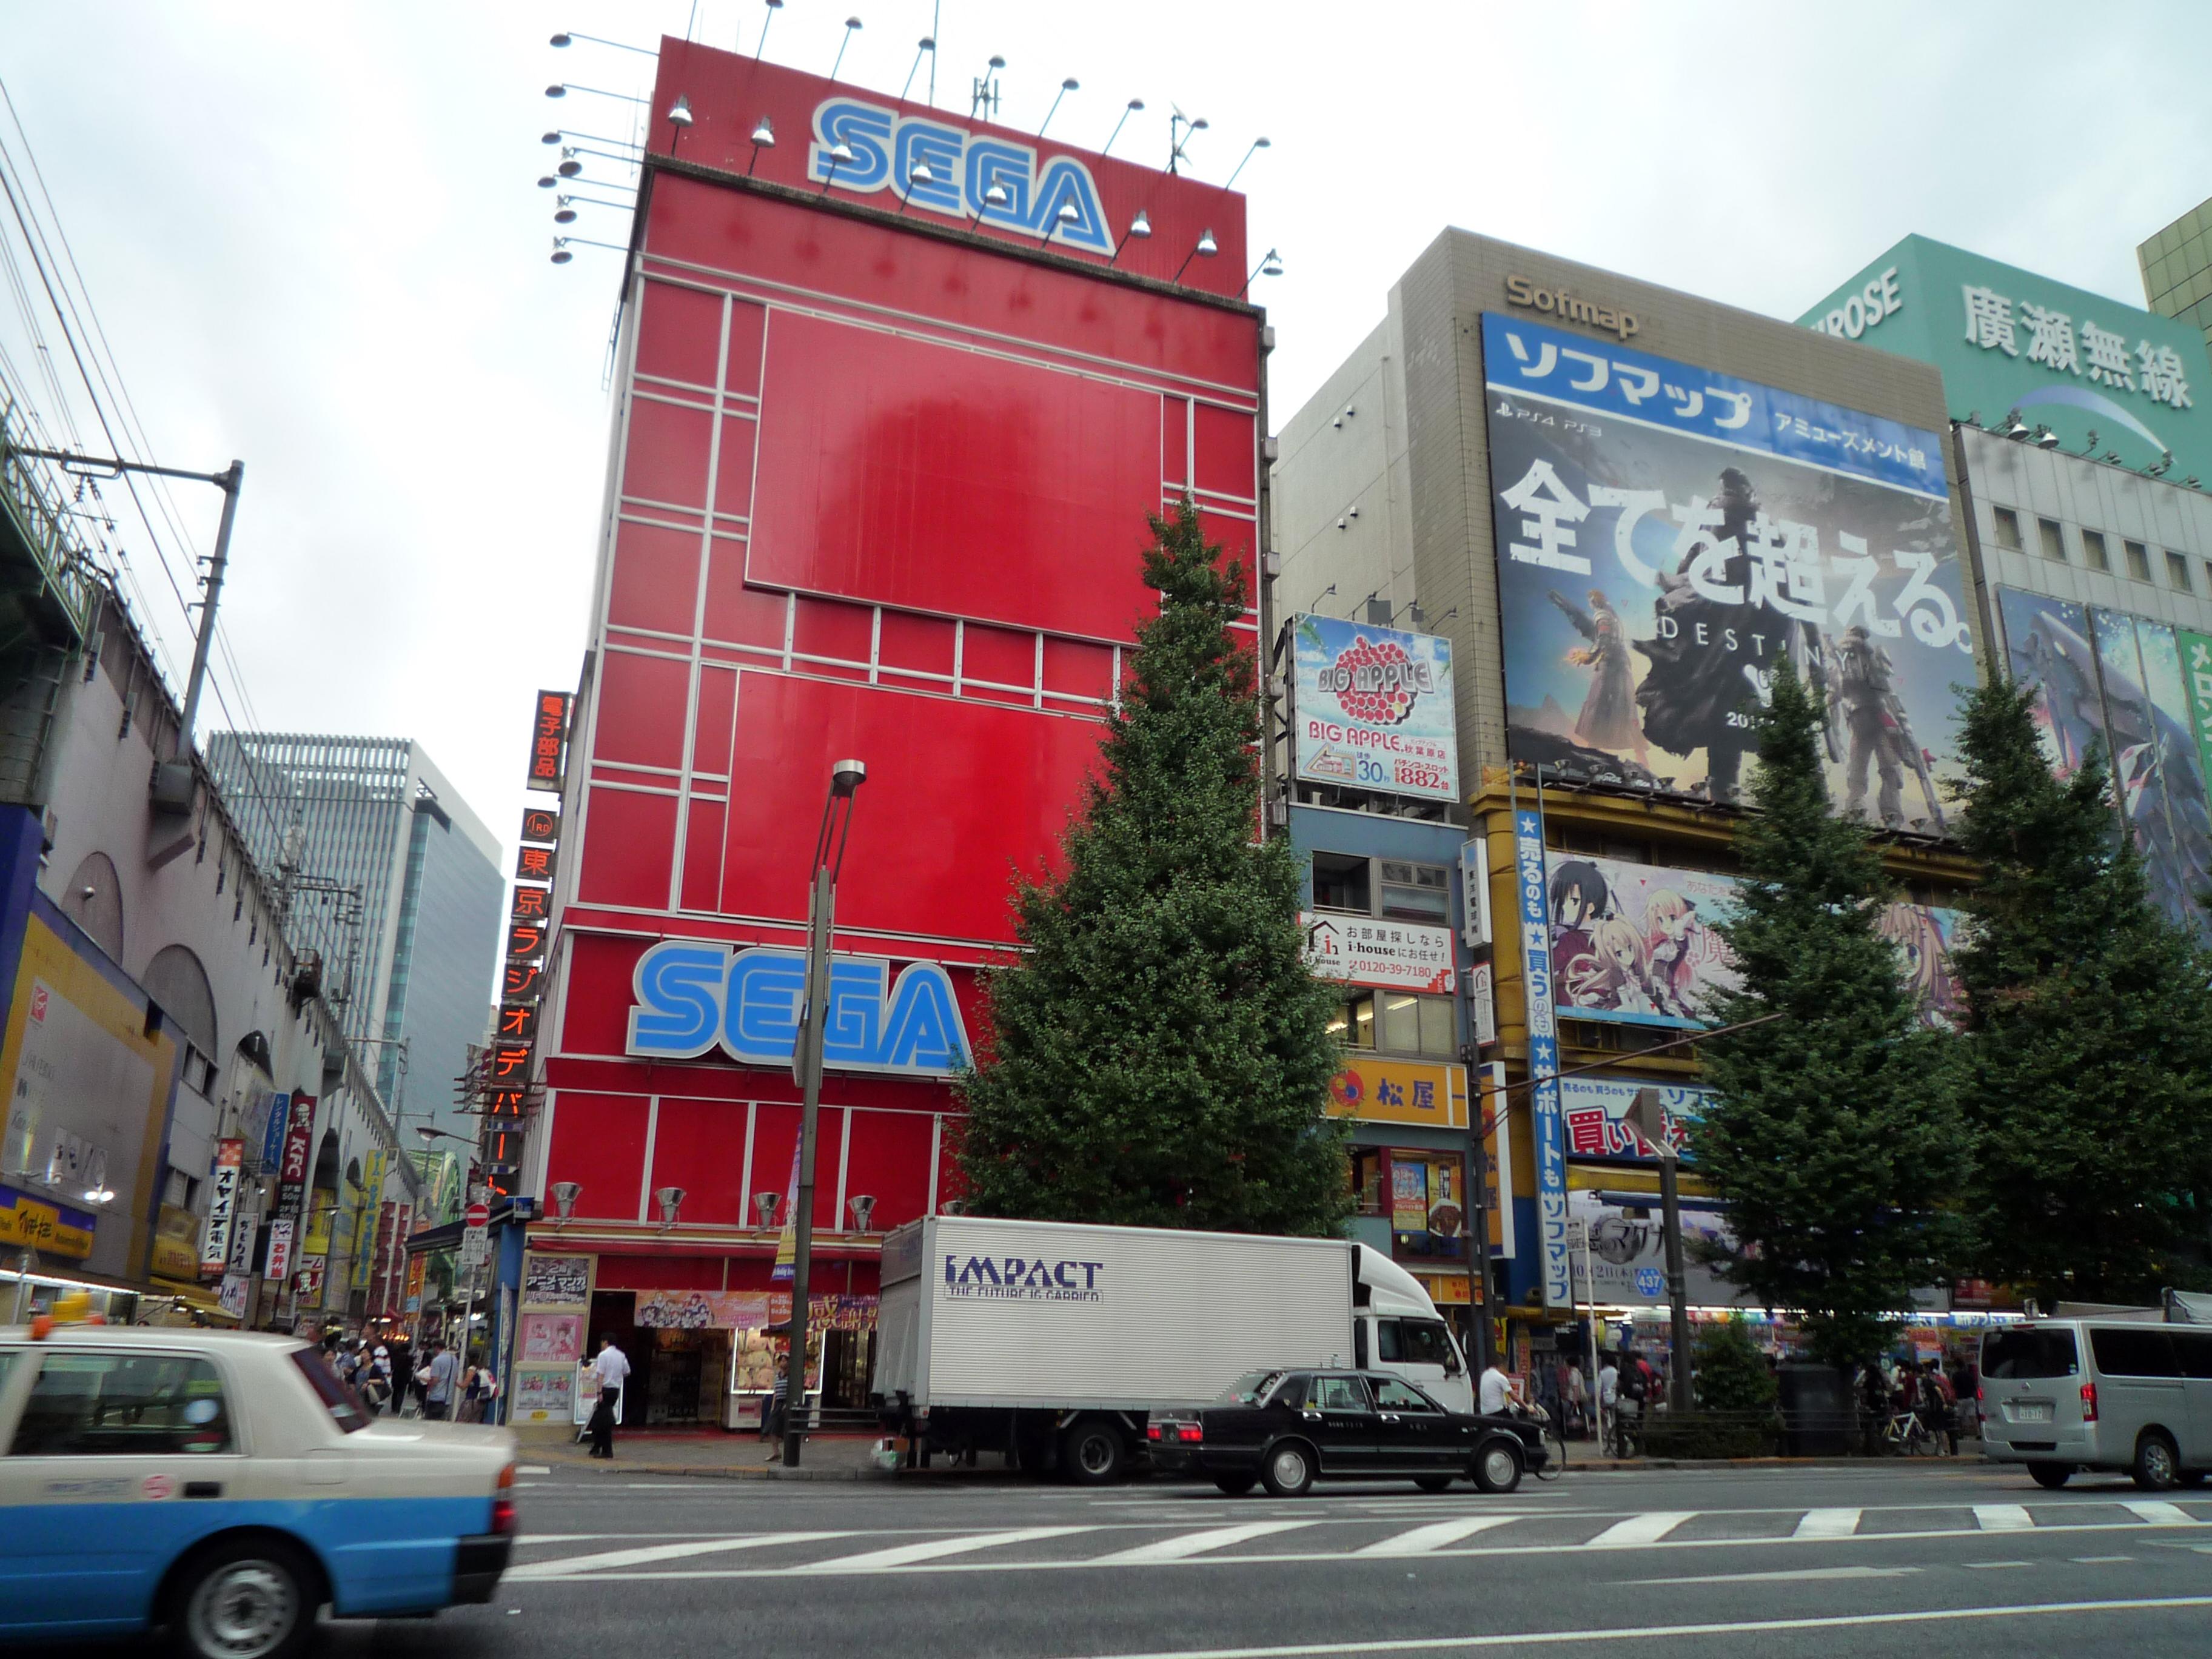 Japon-SegaenAkihabara-GrandVoyage